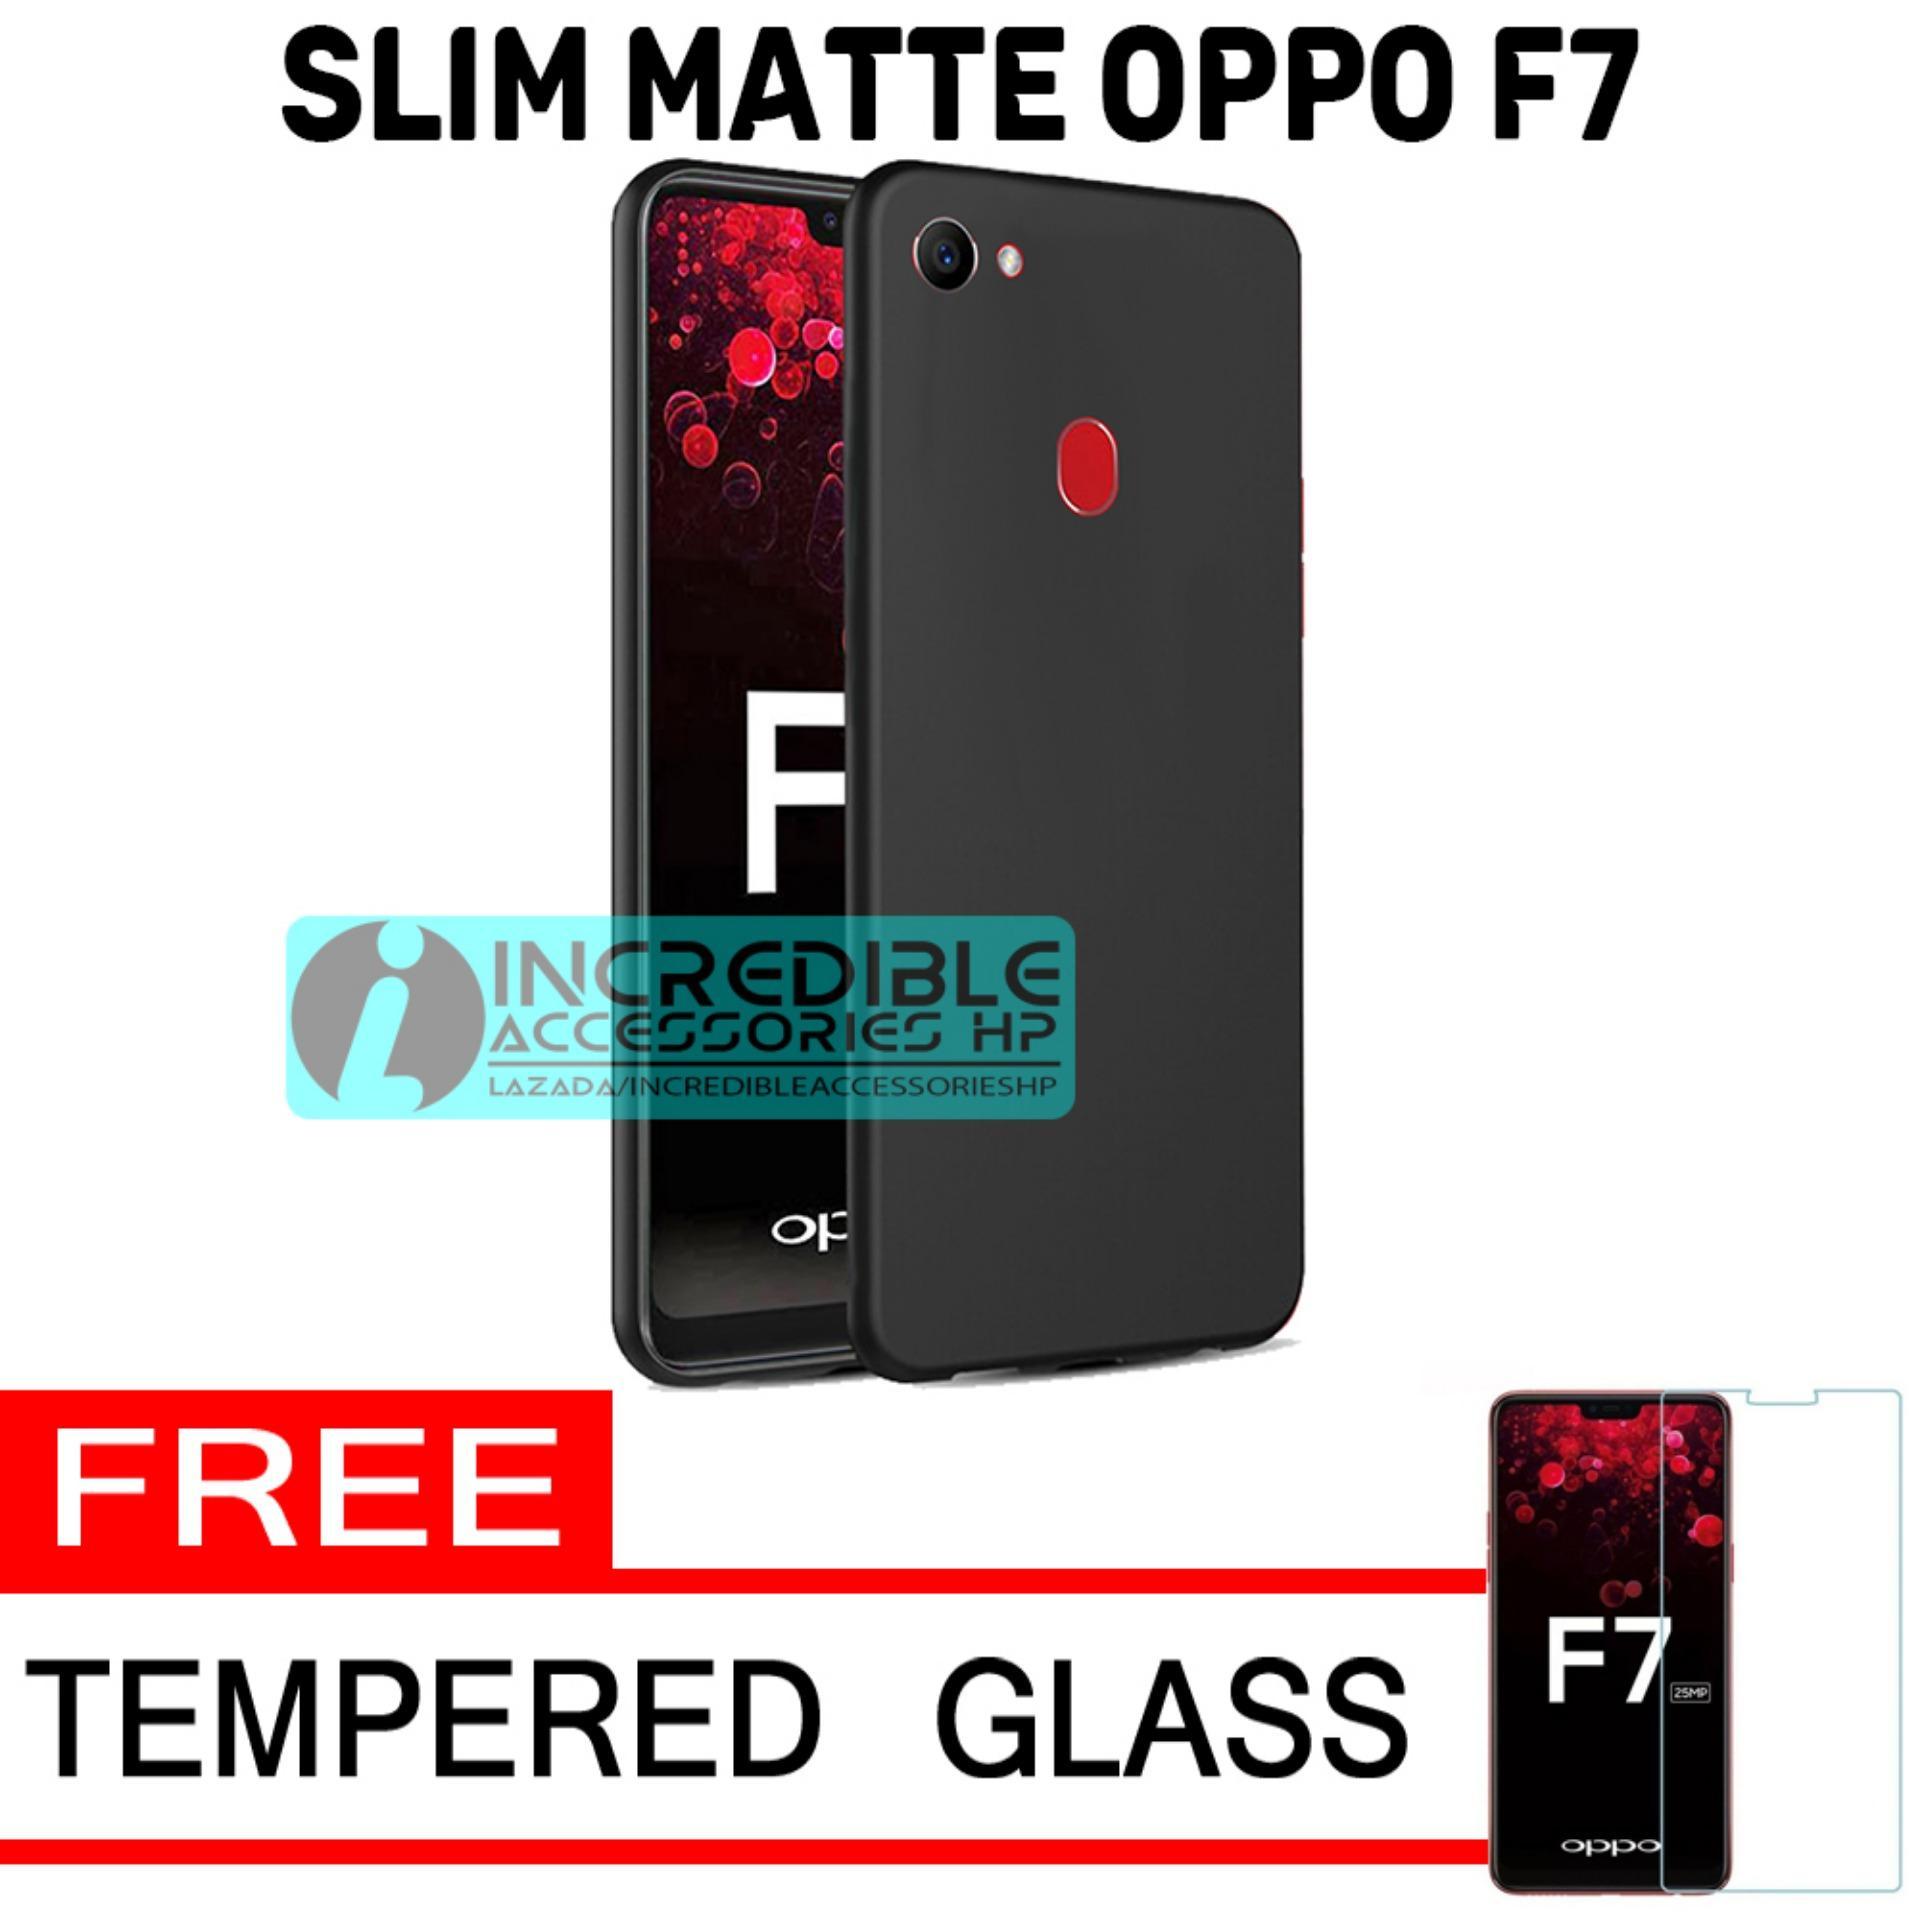 Case Slim Black Matte Baby Skin Softcase Premium Matte for Oppo F7 - Black + Free